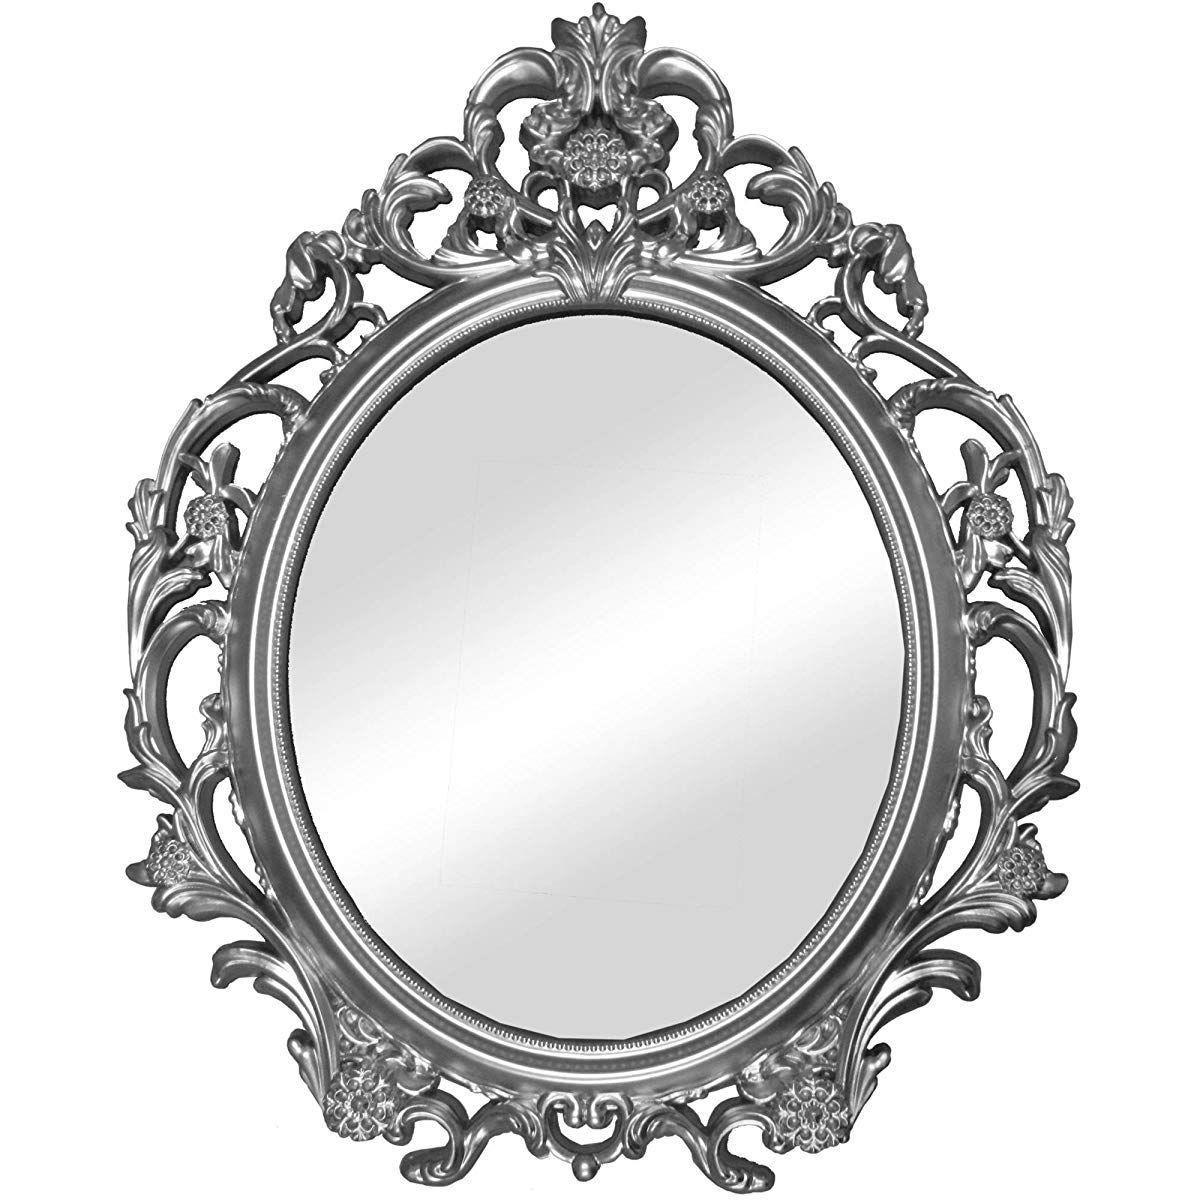 3e6fc355c77b3f8ed1a6410a466994aa - Better Homes And Gardens Baroque Mirror